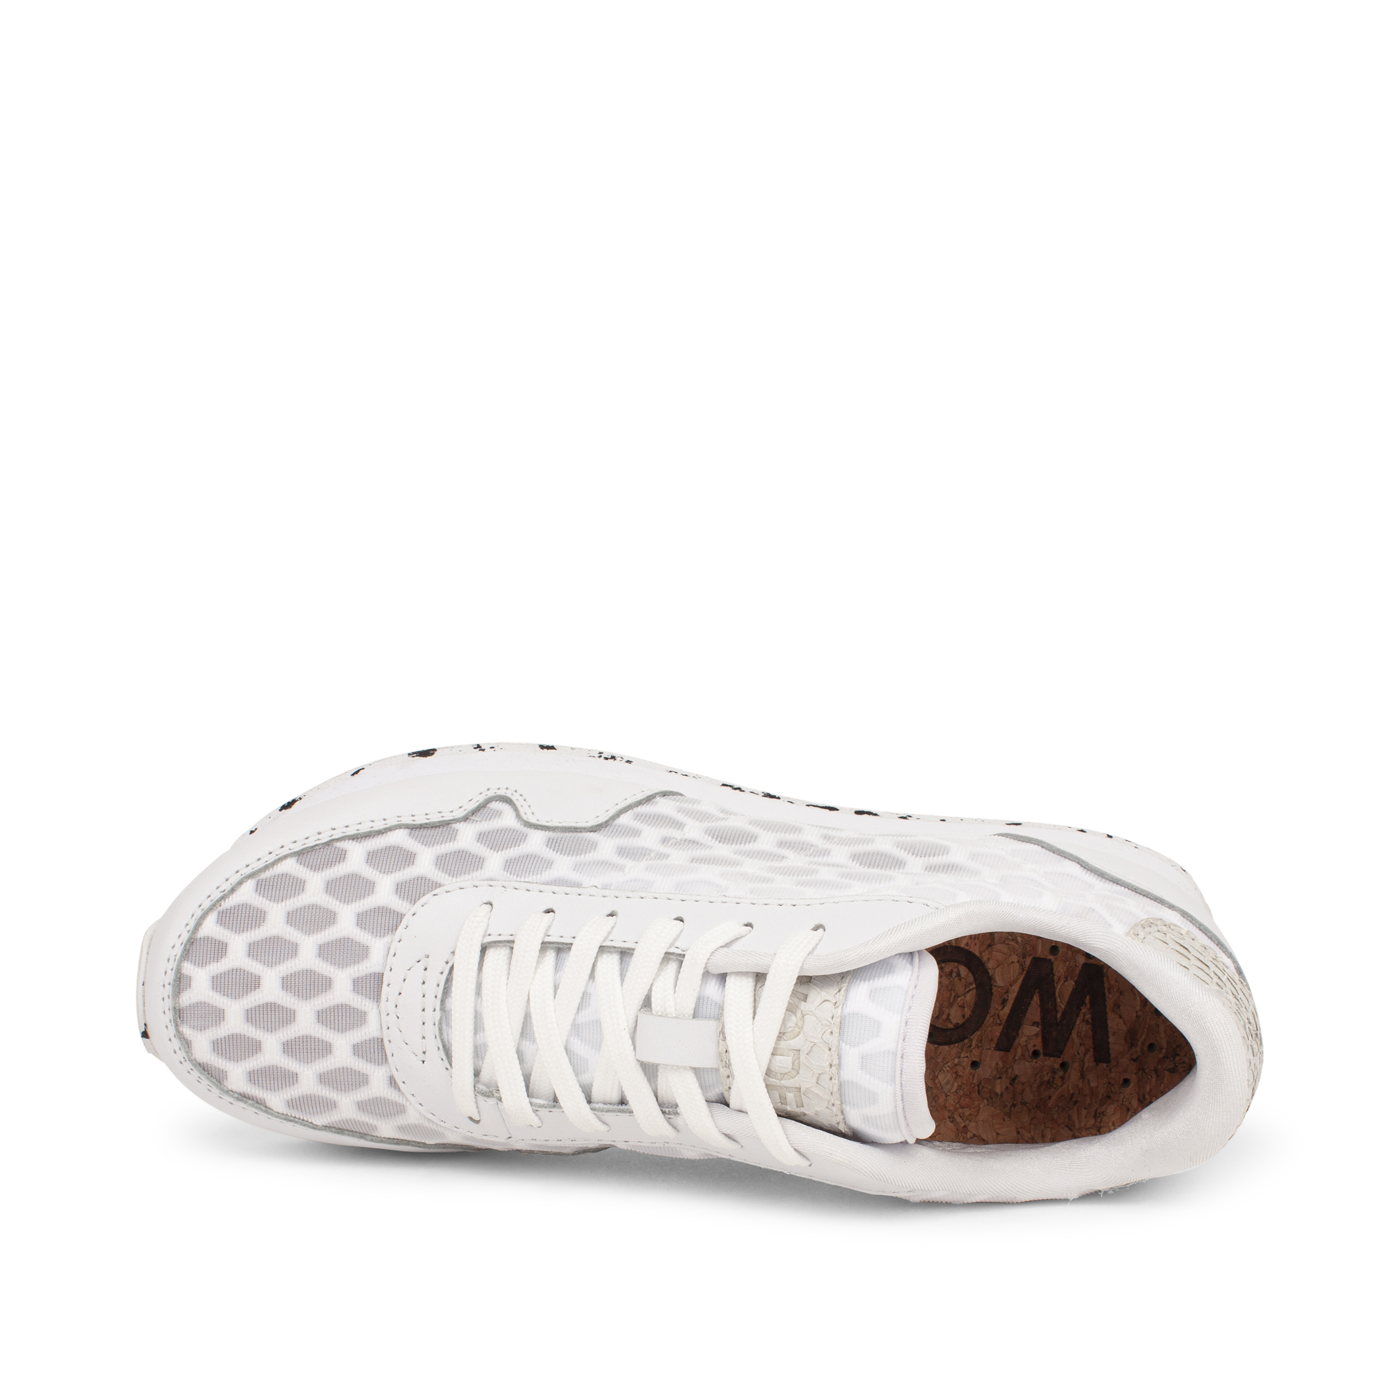 Nora III Mesh Leather Bright White